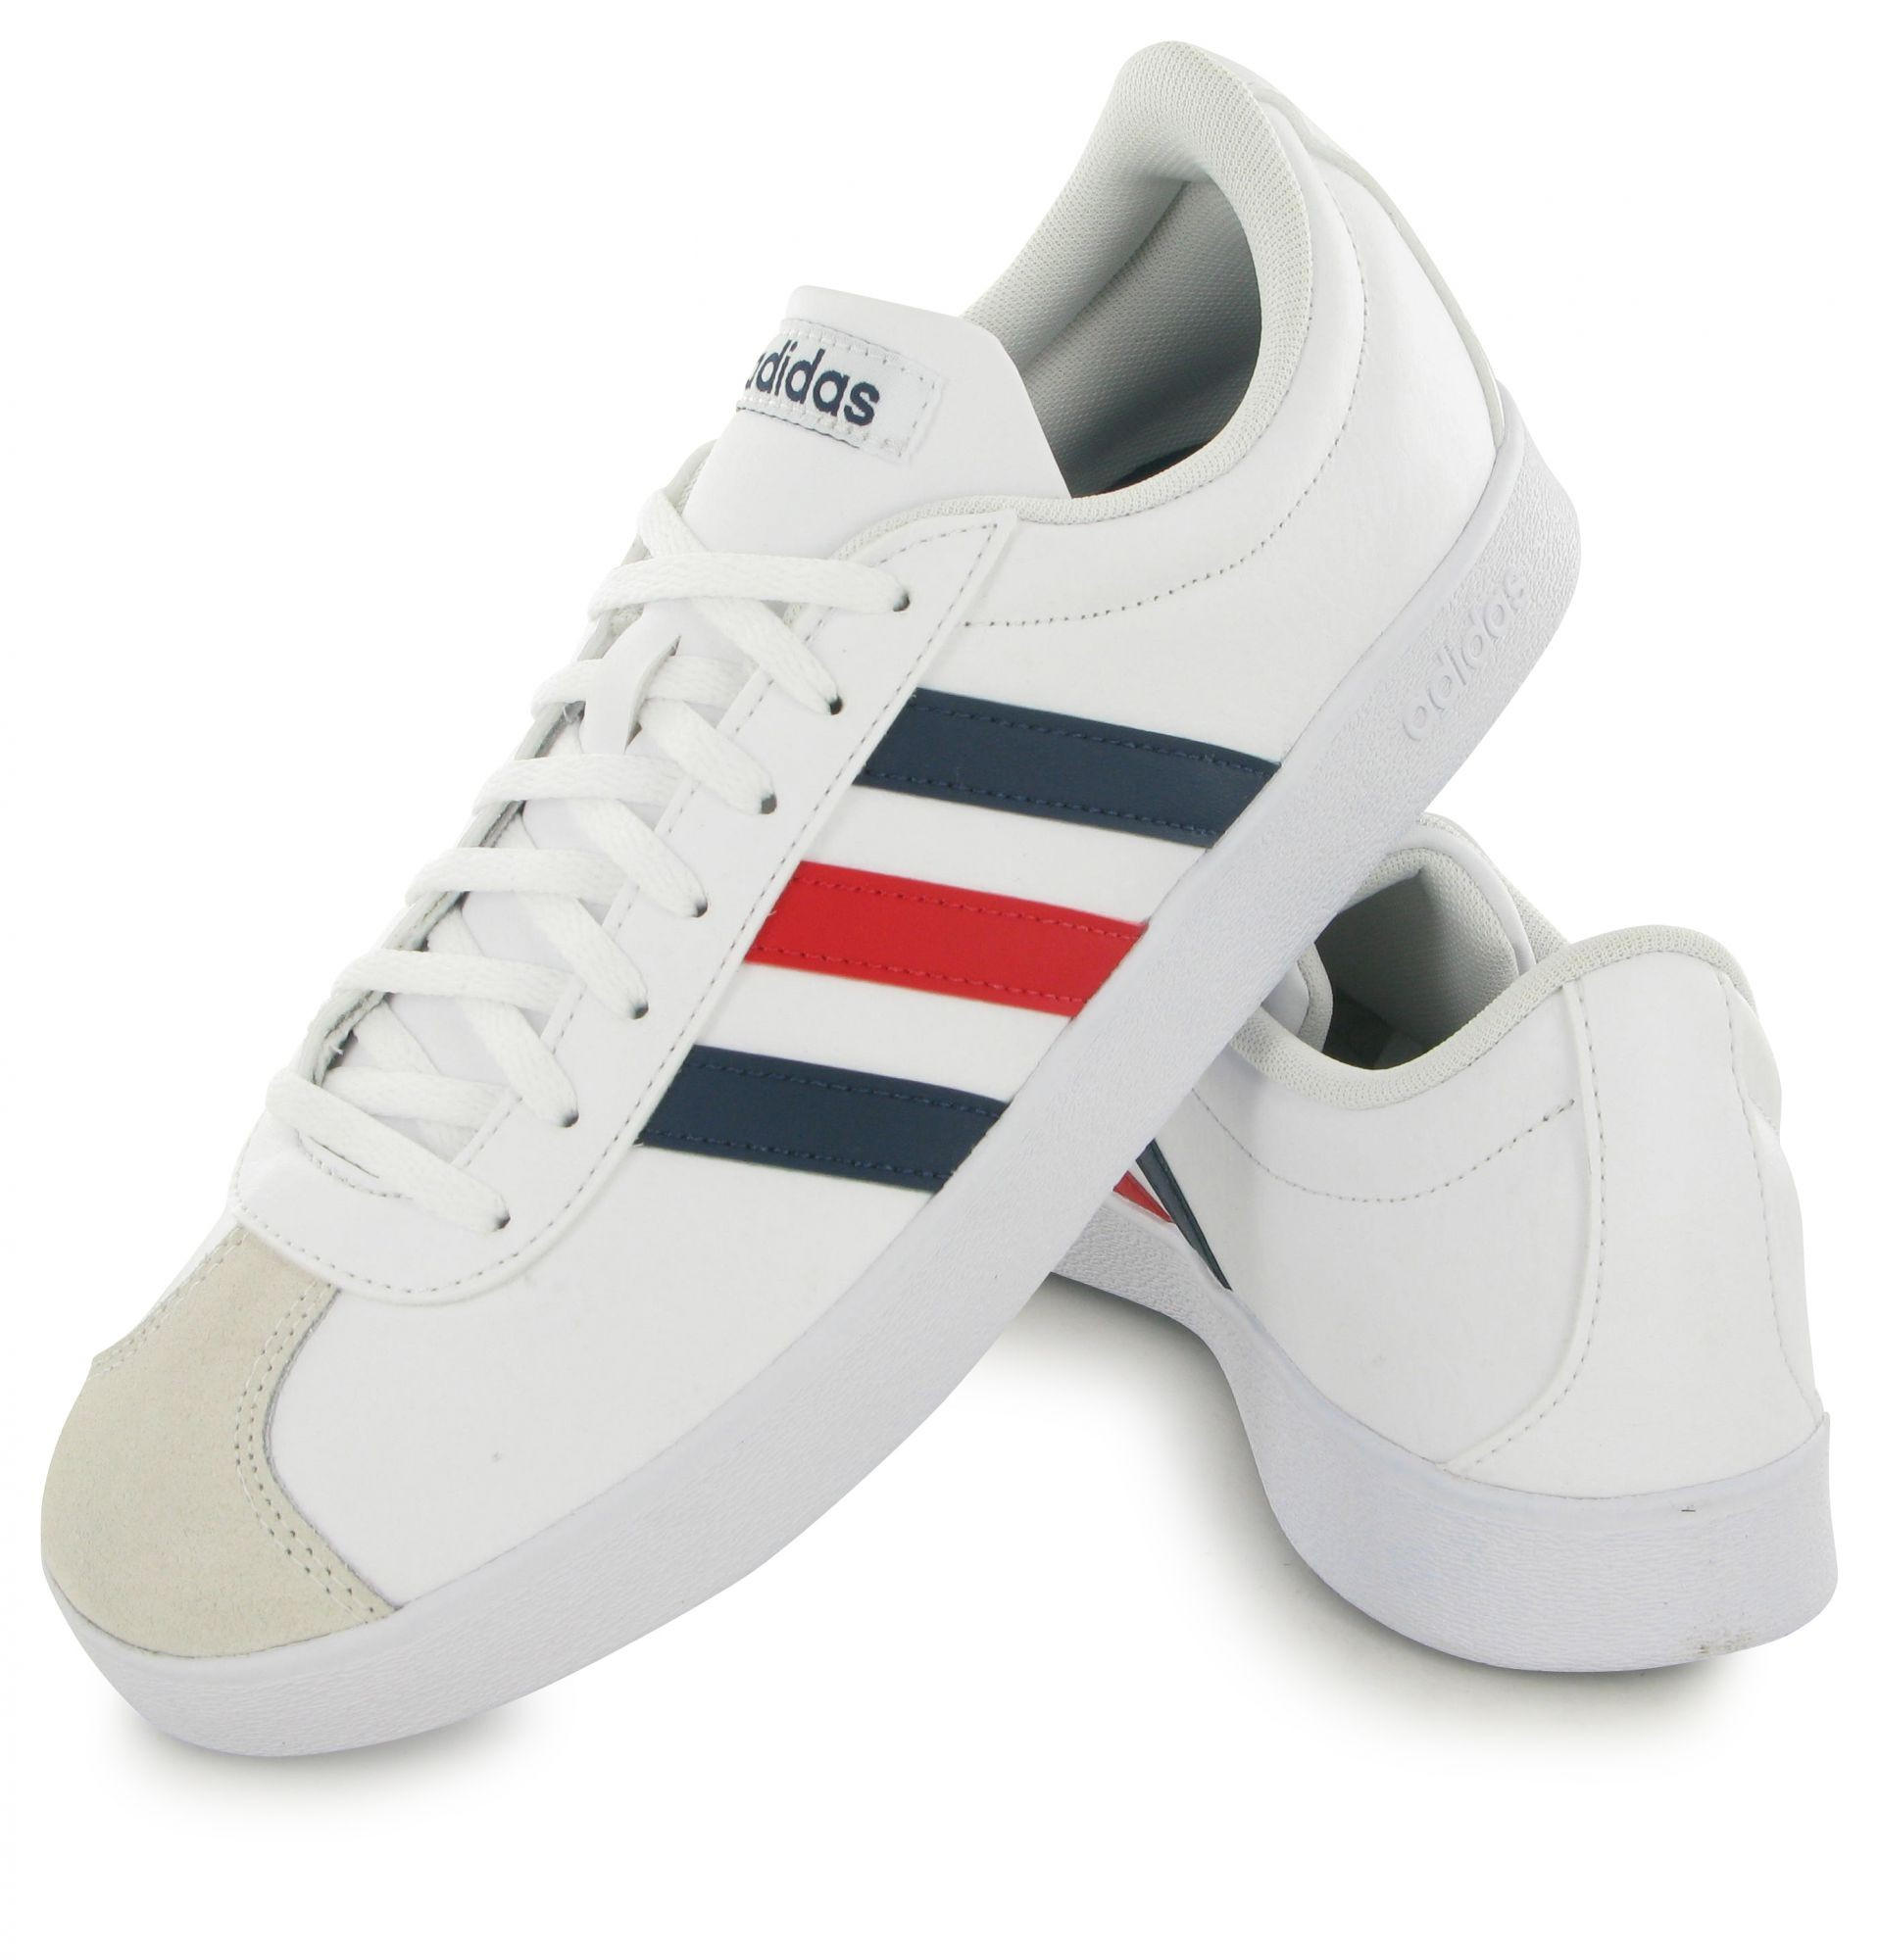 cheaper 44356 9fe32 Adidas-Scarpe-Sneakers-Ginnastica-Tennis-Sportswear-Lifestyle-Vl-